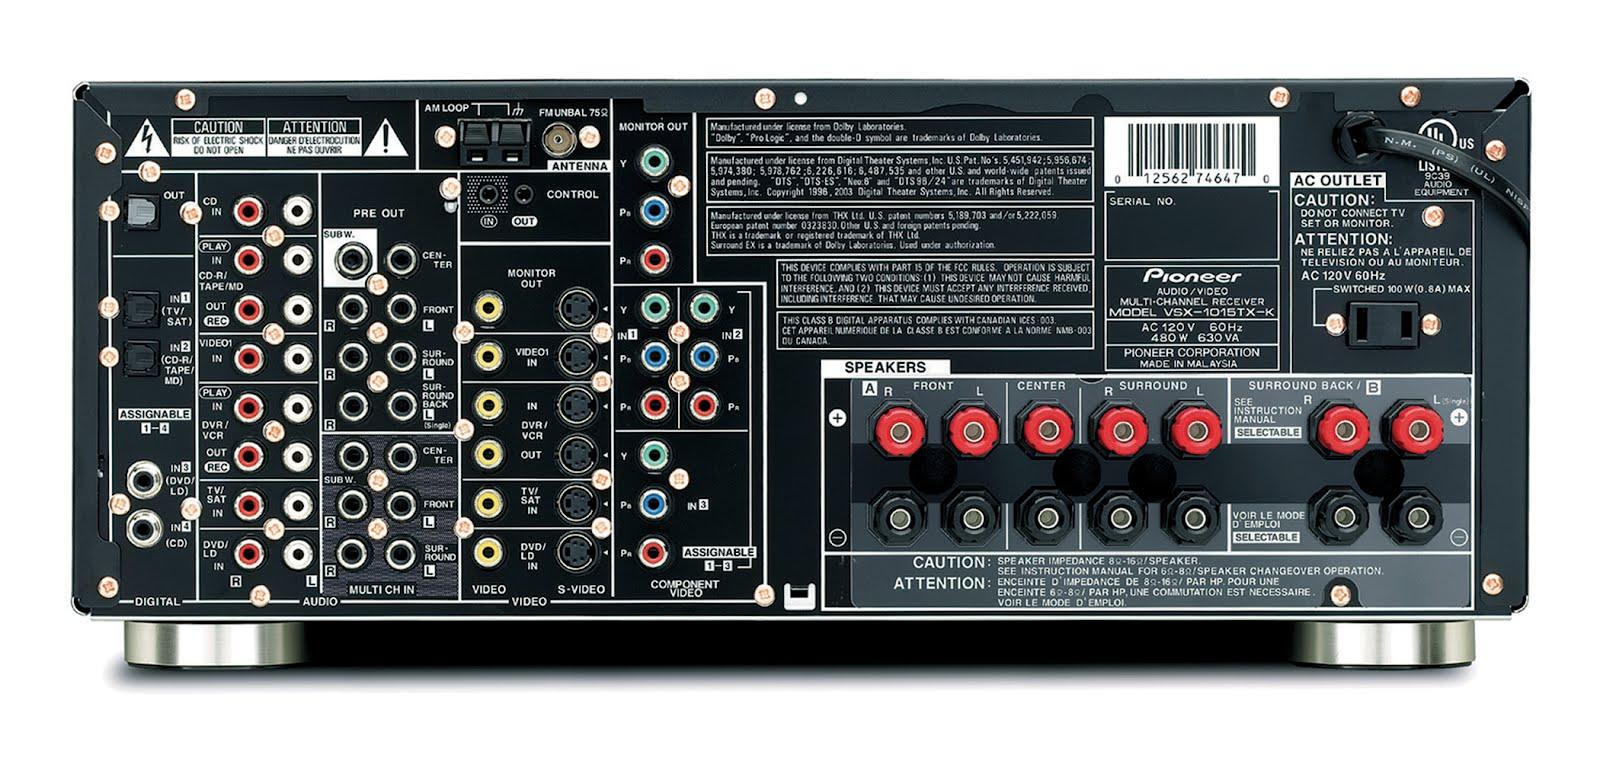 Pioneer Vsx-1015-s Service Manual